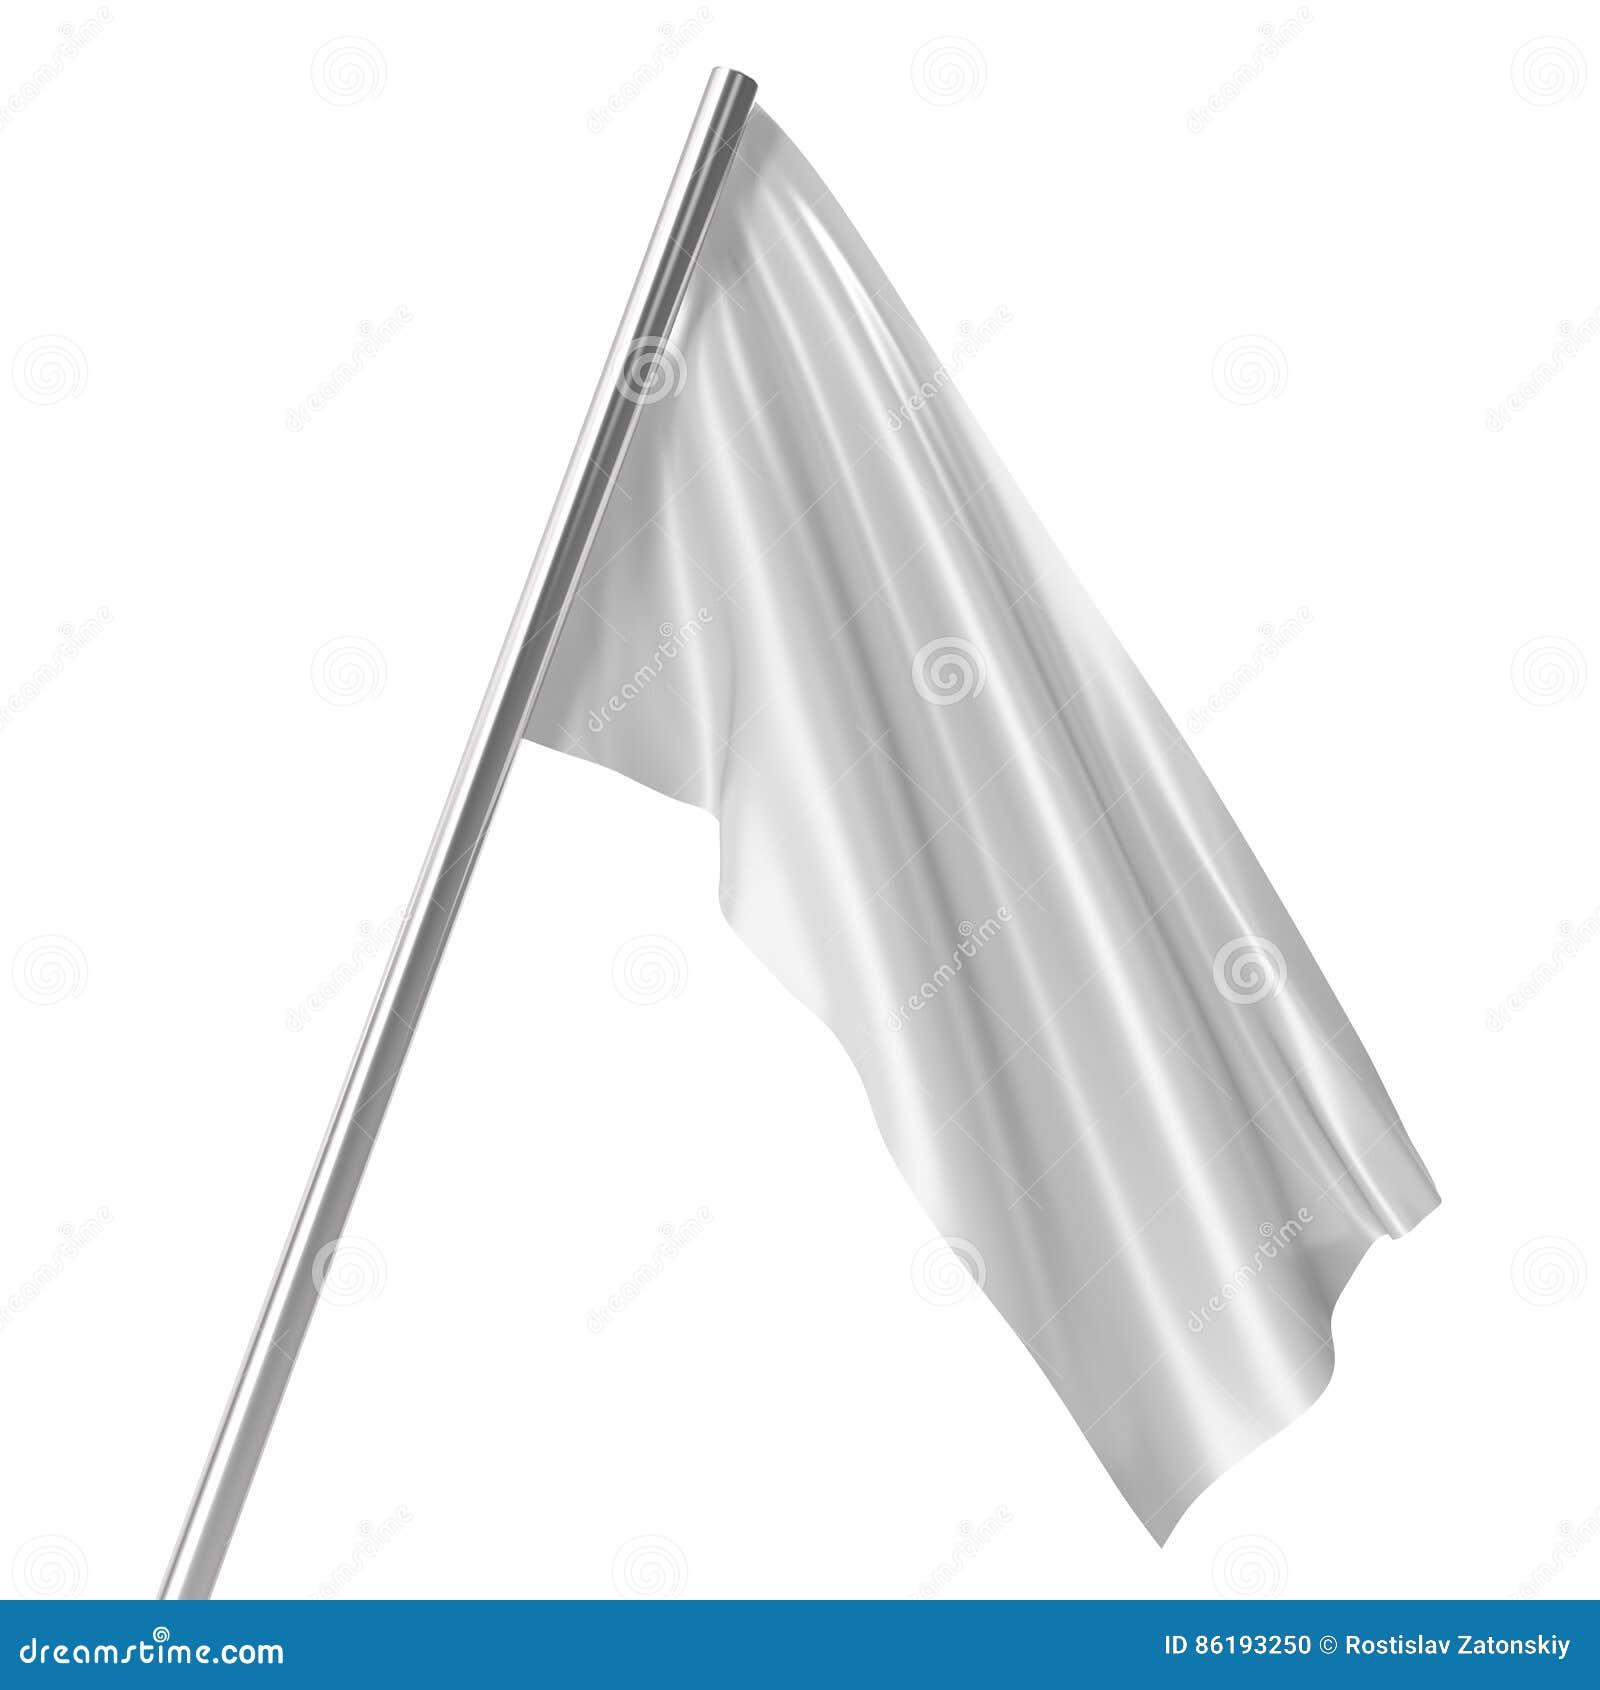 White flag on flagpole at rest empty mockup flag isolated on white background. Blank  sc 1 st  Dreamstime.com & White Flag On Flagpole At Rest Empty Mockup Flag Isolated On White ...